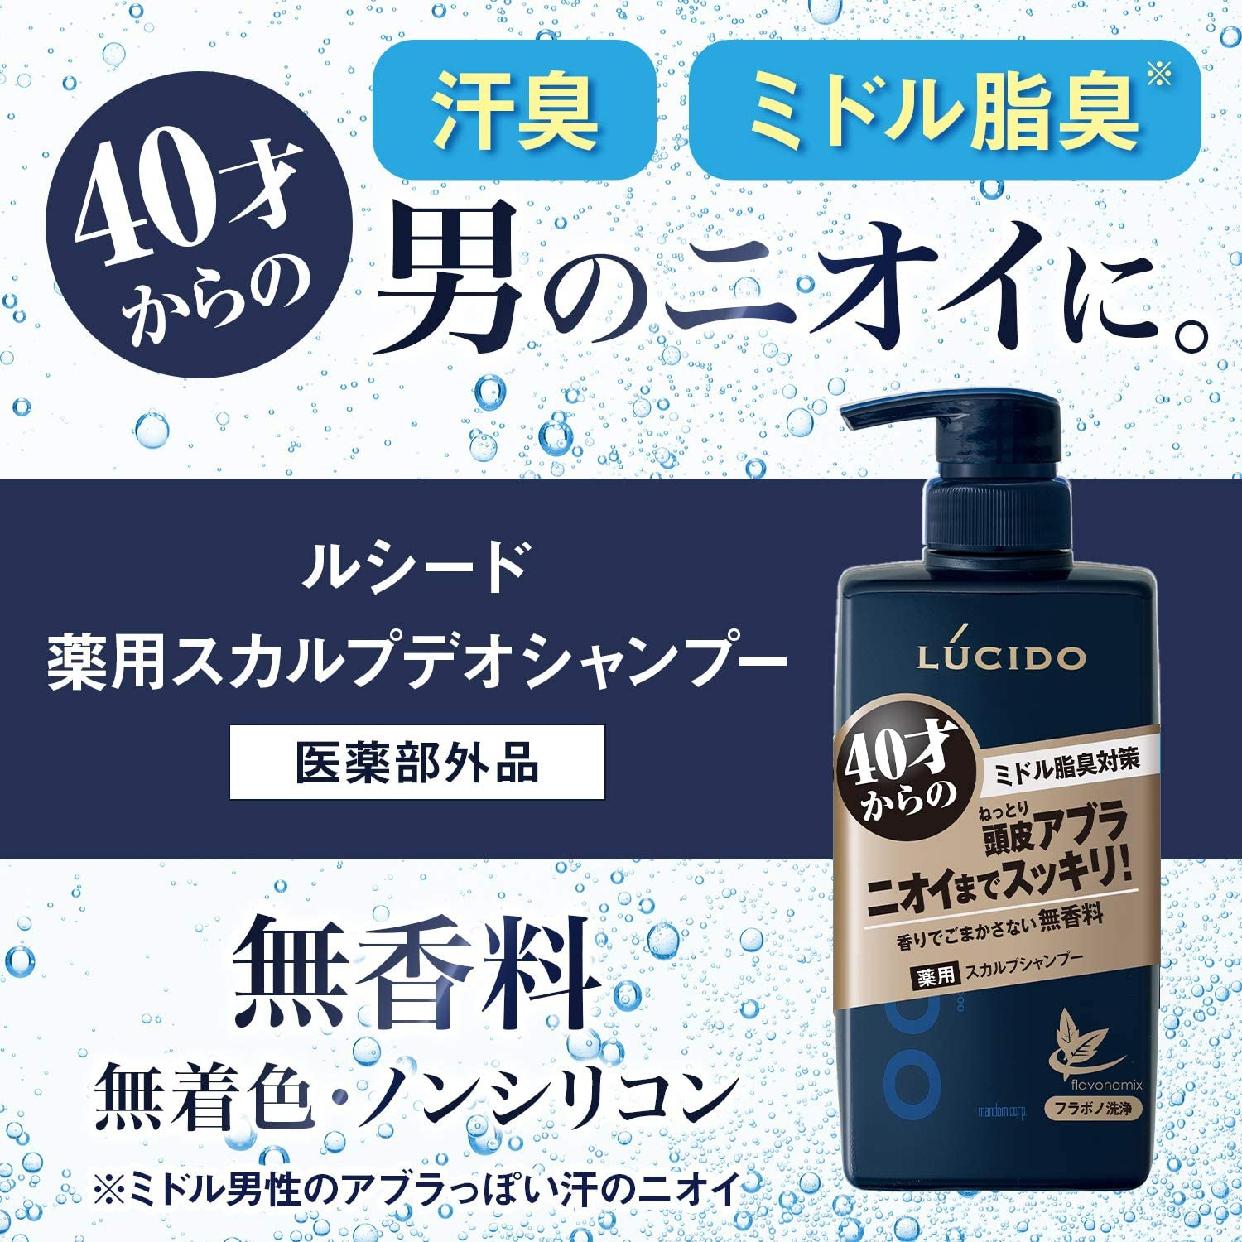 LUCIDO(ルシード) 薬用スカルプデオシャンプーの商品画像6